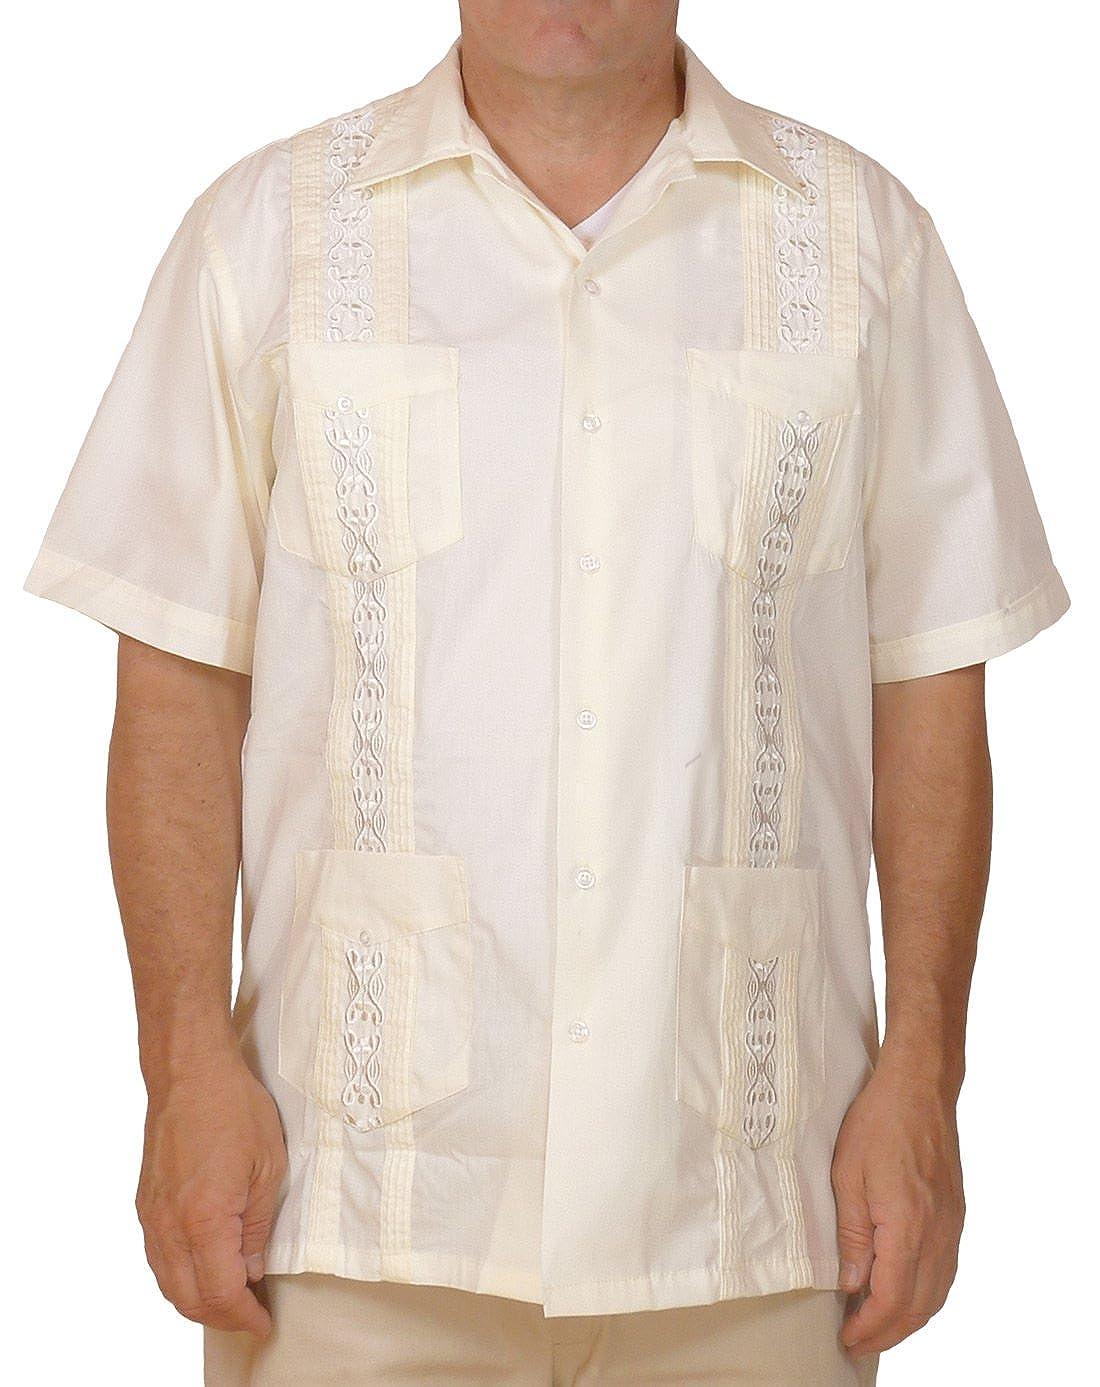 598fae79c7 Squish Cuban Style Guayabera Shirt Cream at Amazon Men s Clothing store